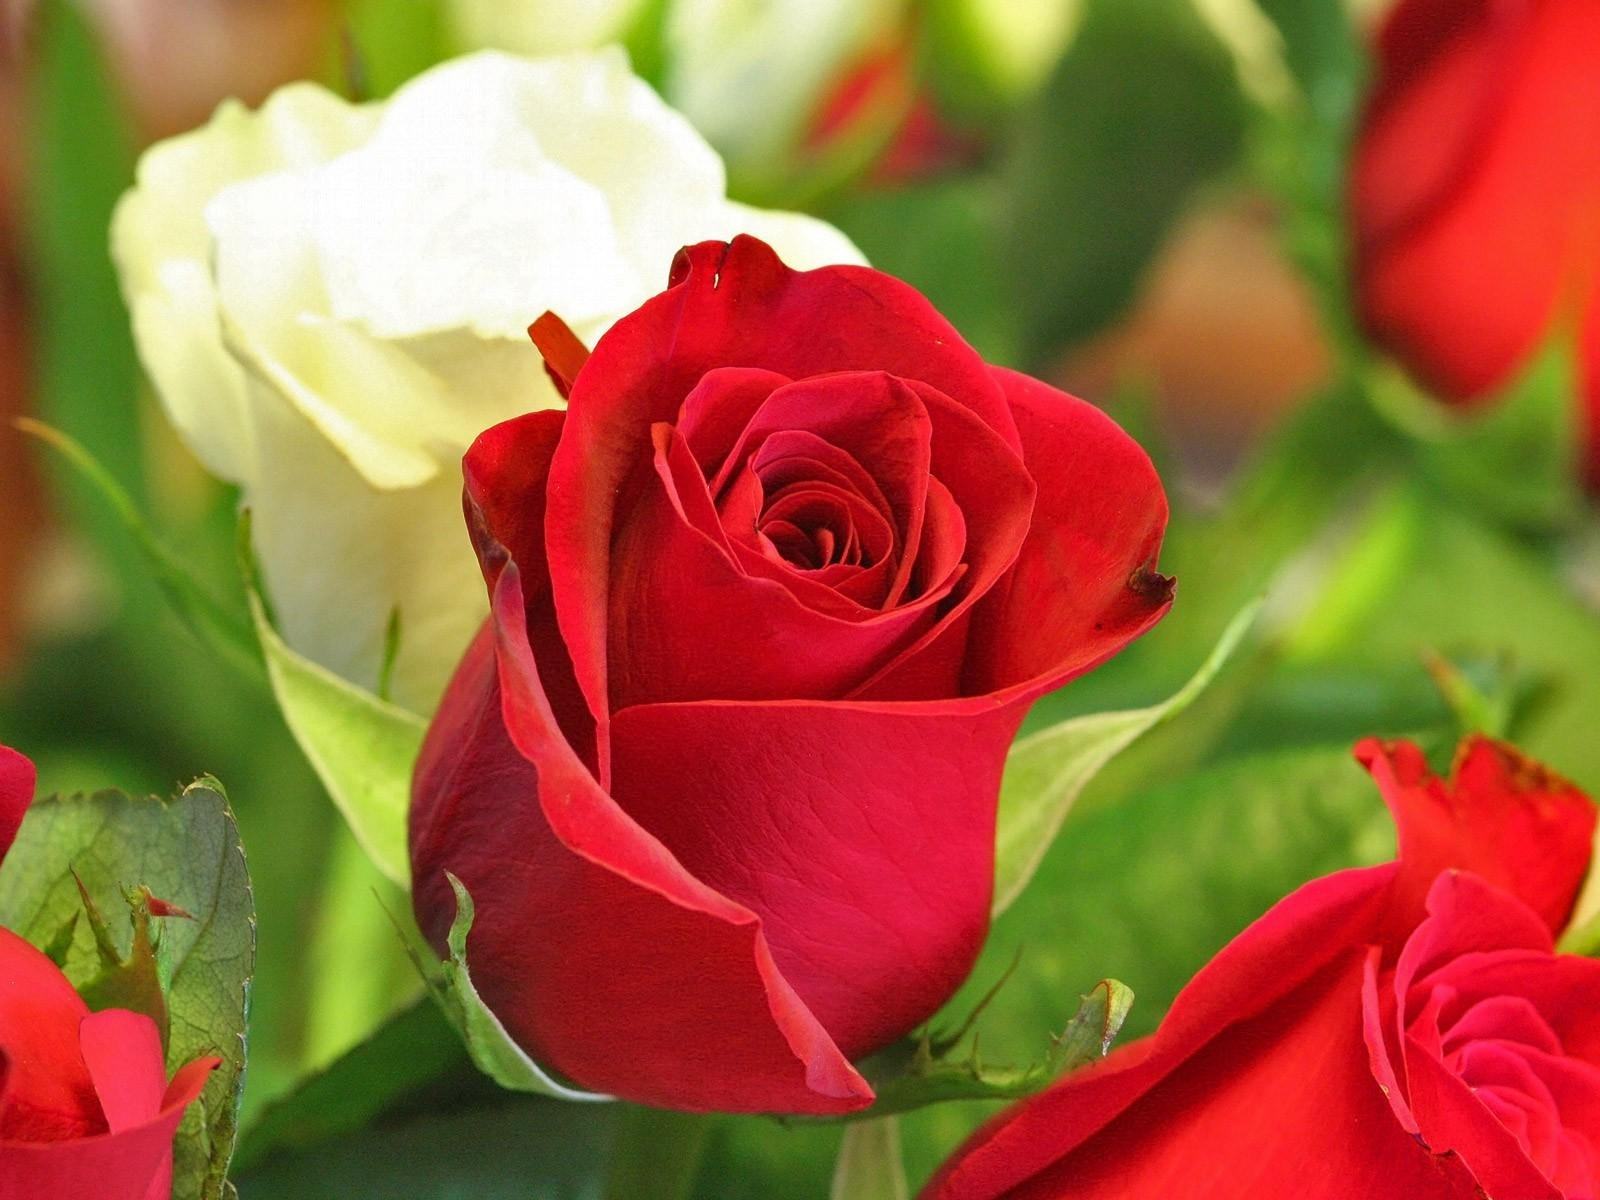 rose flower images free download hd download